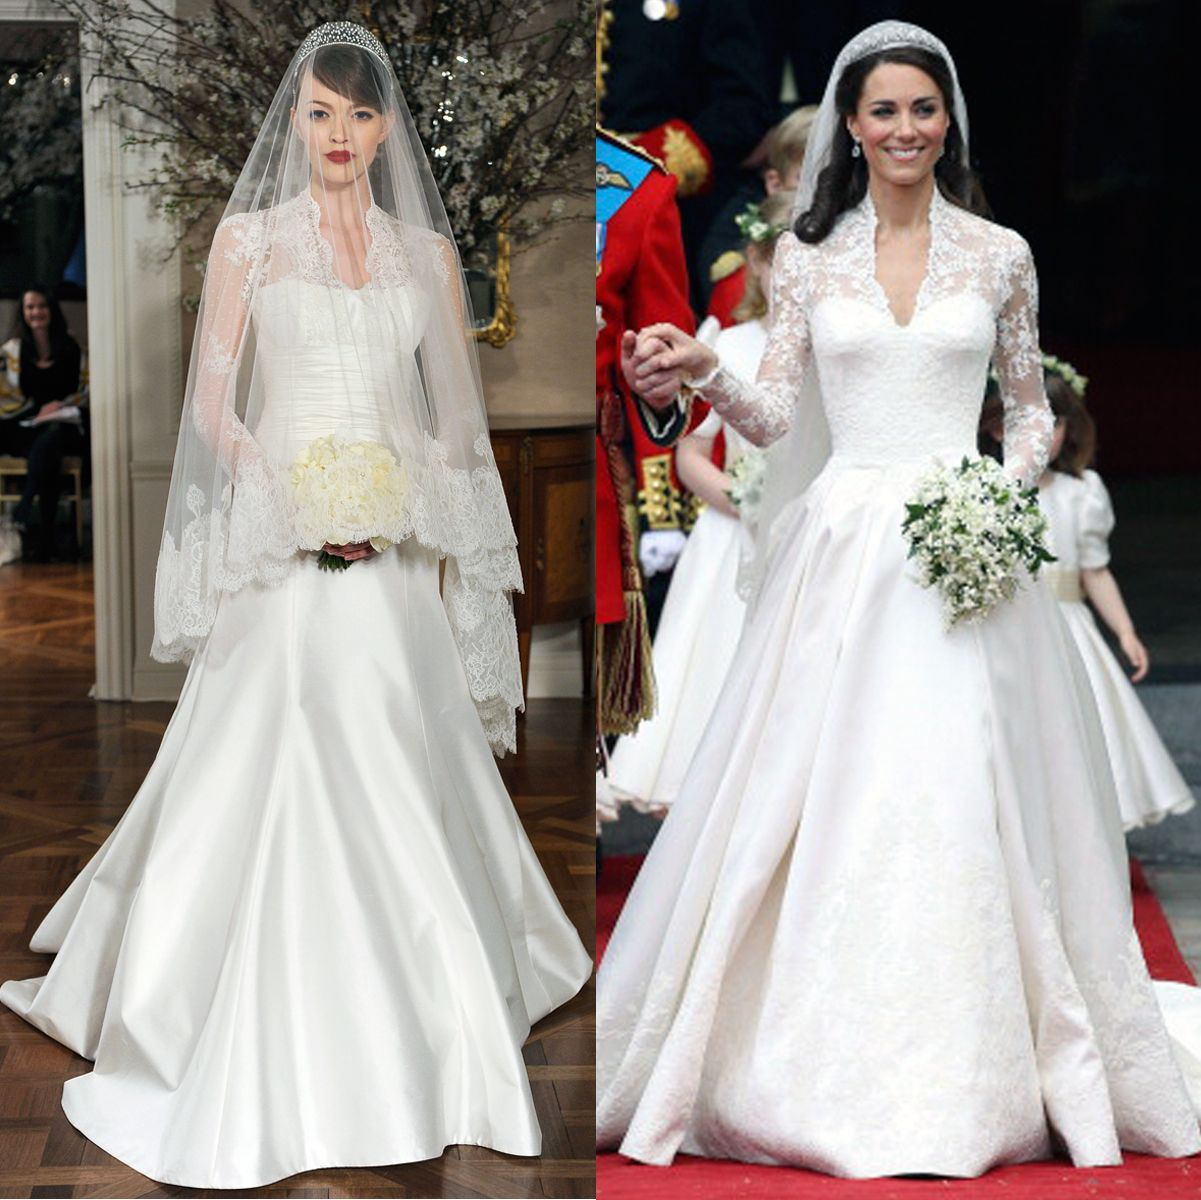 Three Royal Wedding Dresses Predicted By Romona Keveža